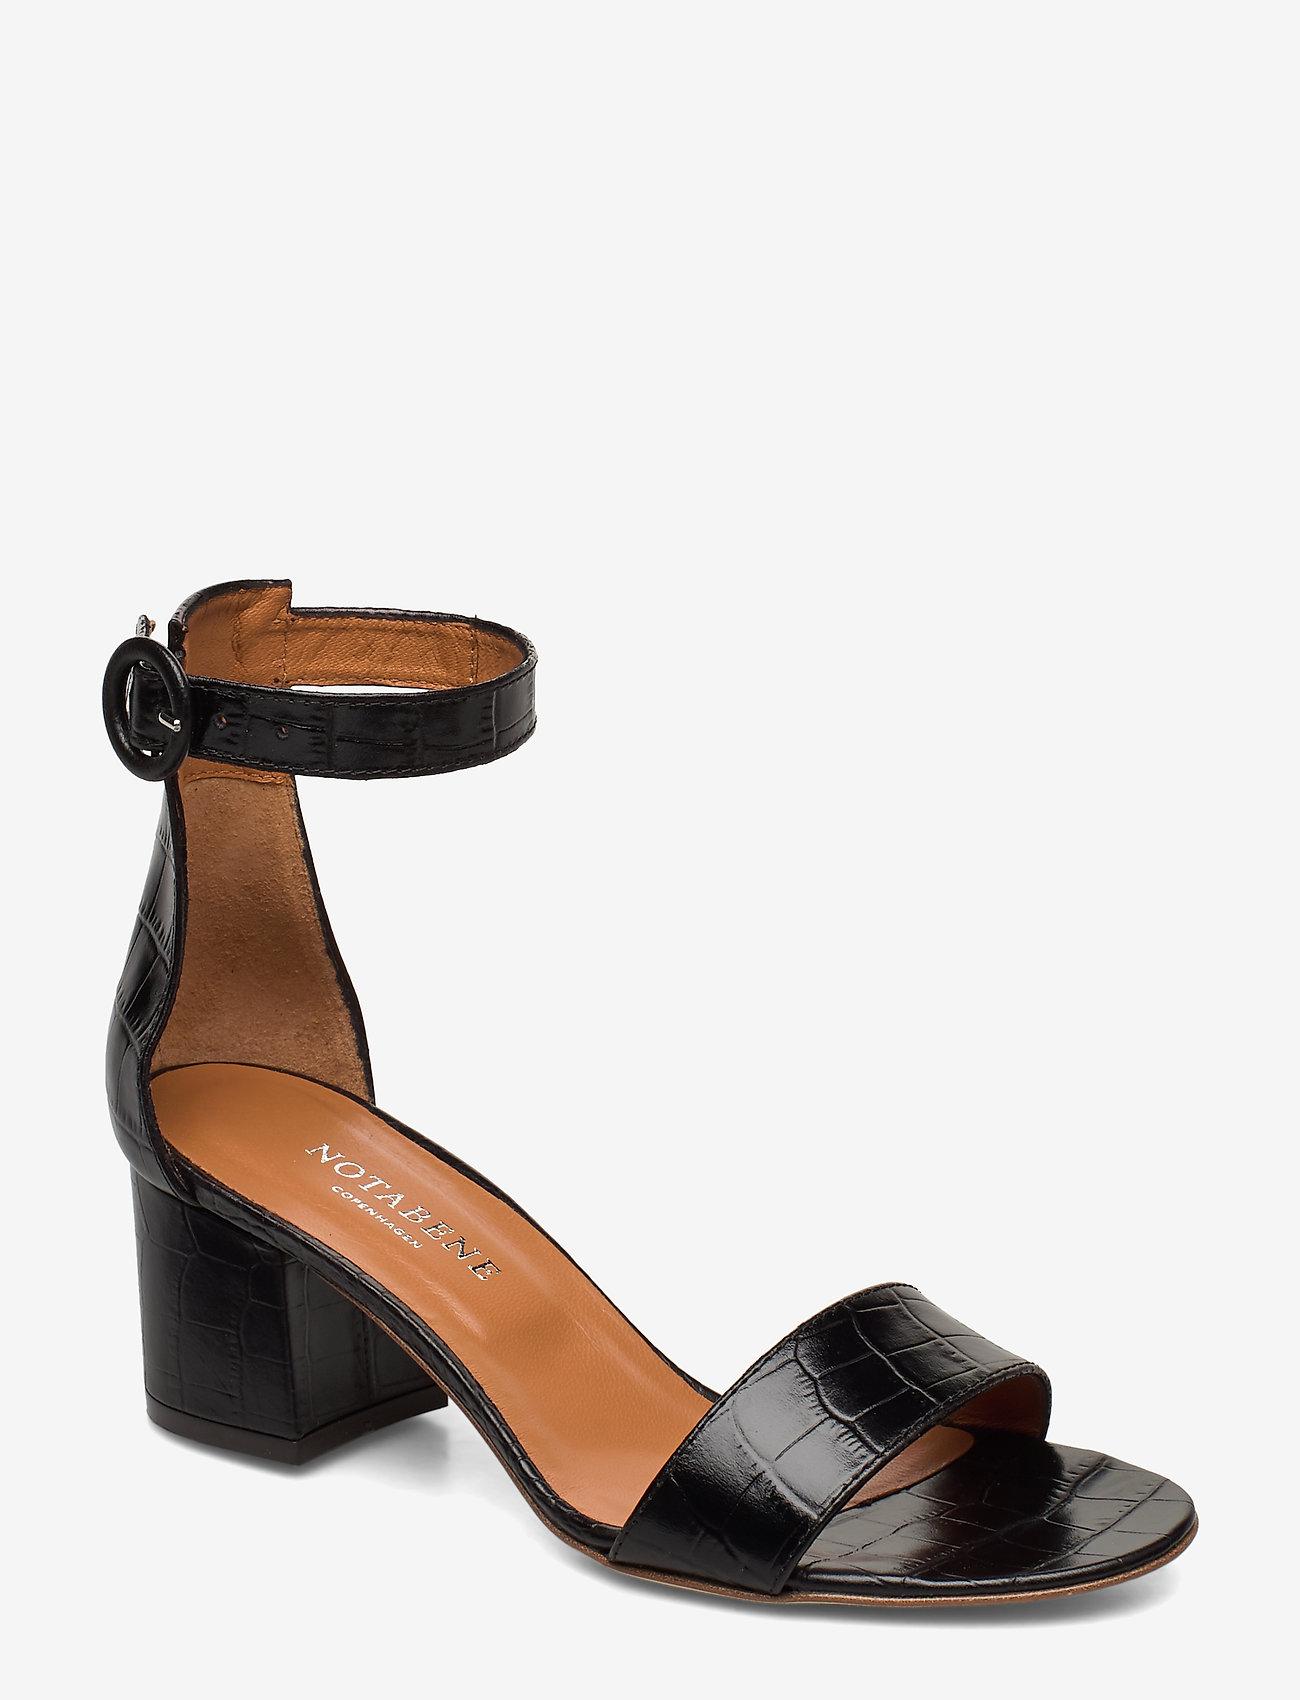 NOTABENE - Lia - høyhælte sandaler - black croco leather - 0